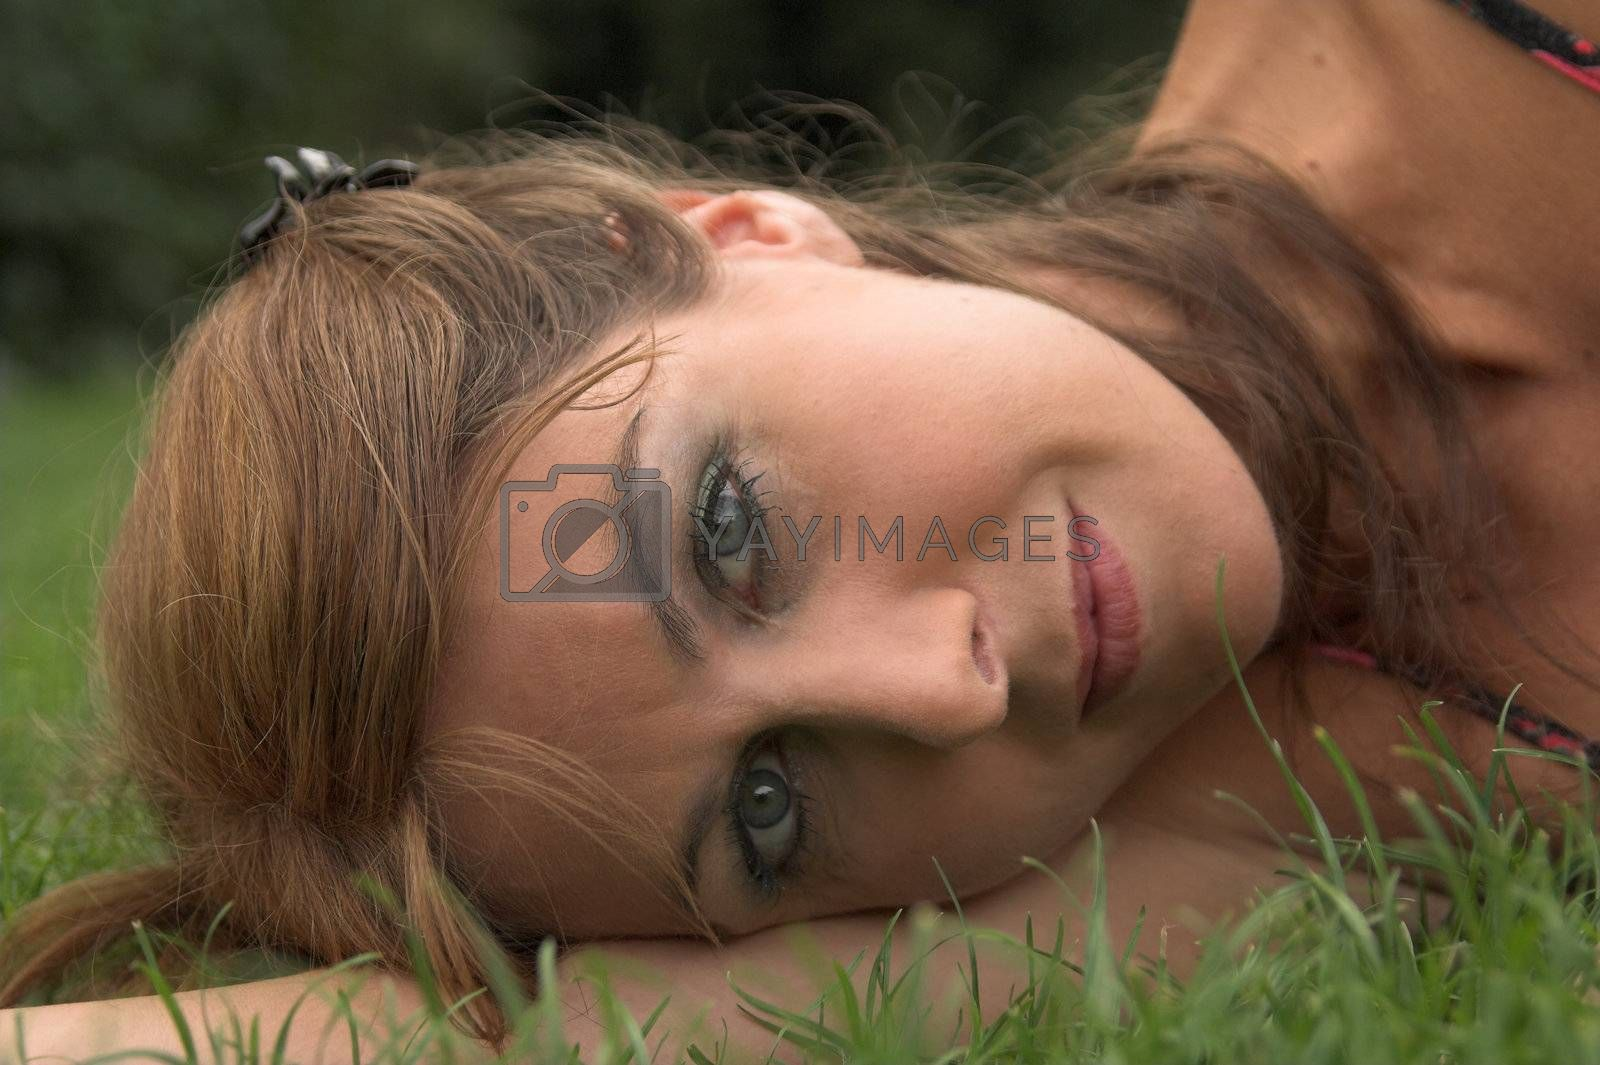 Head portrait on grass by MikLav